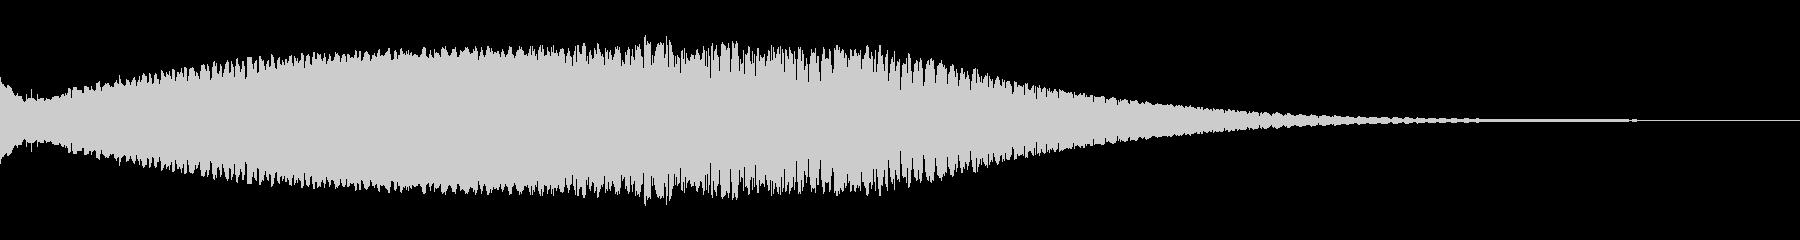 Scifi_FX_下降する電子音キュ〜ンの未再生の波形